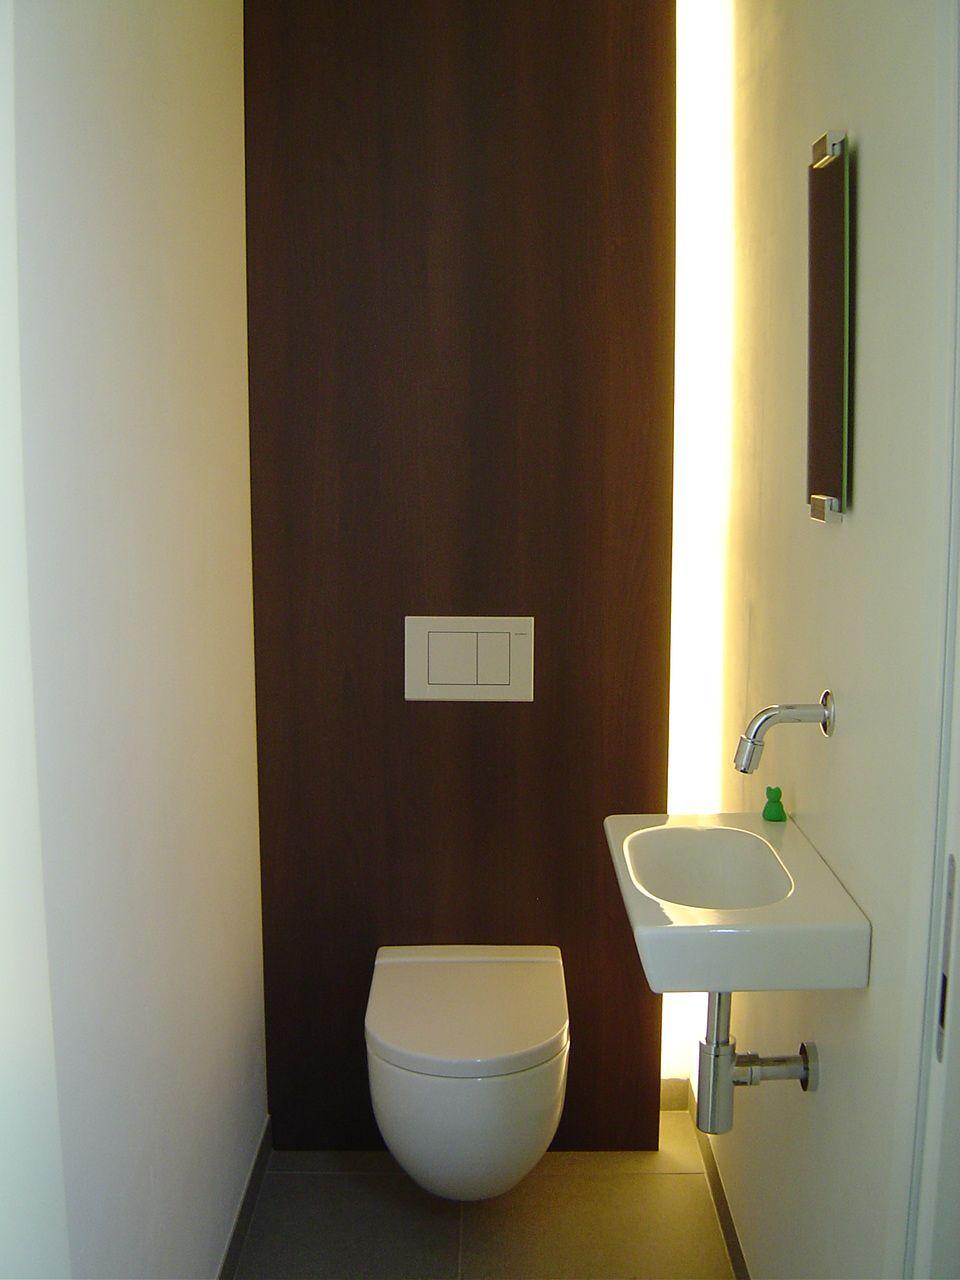 Led badkamer ontwerp verlichting - Mooie eigentijdse badkamer ...